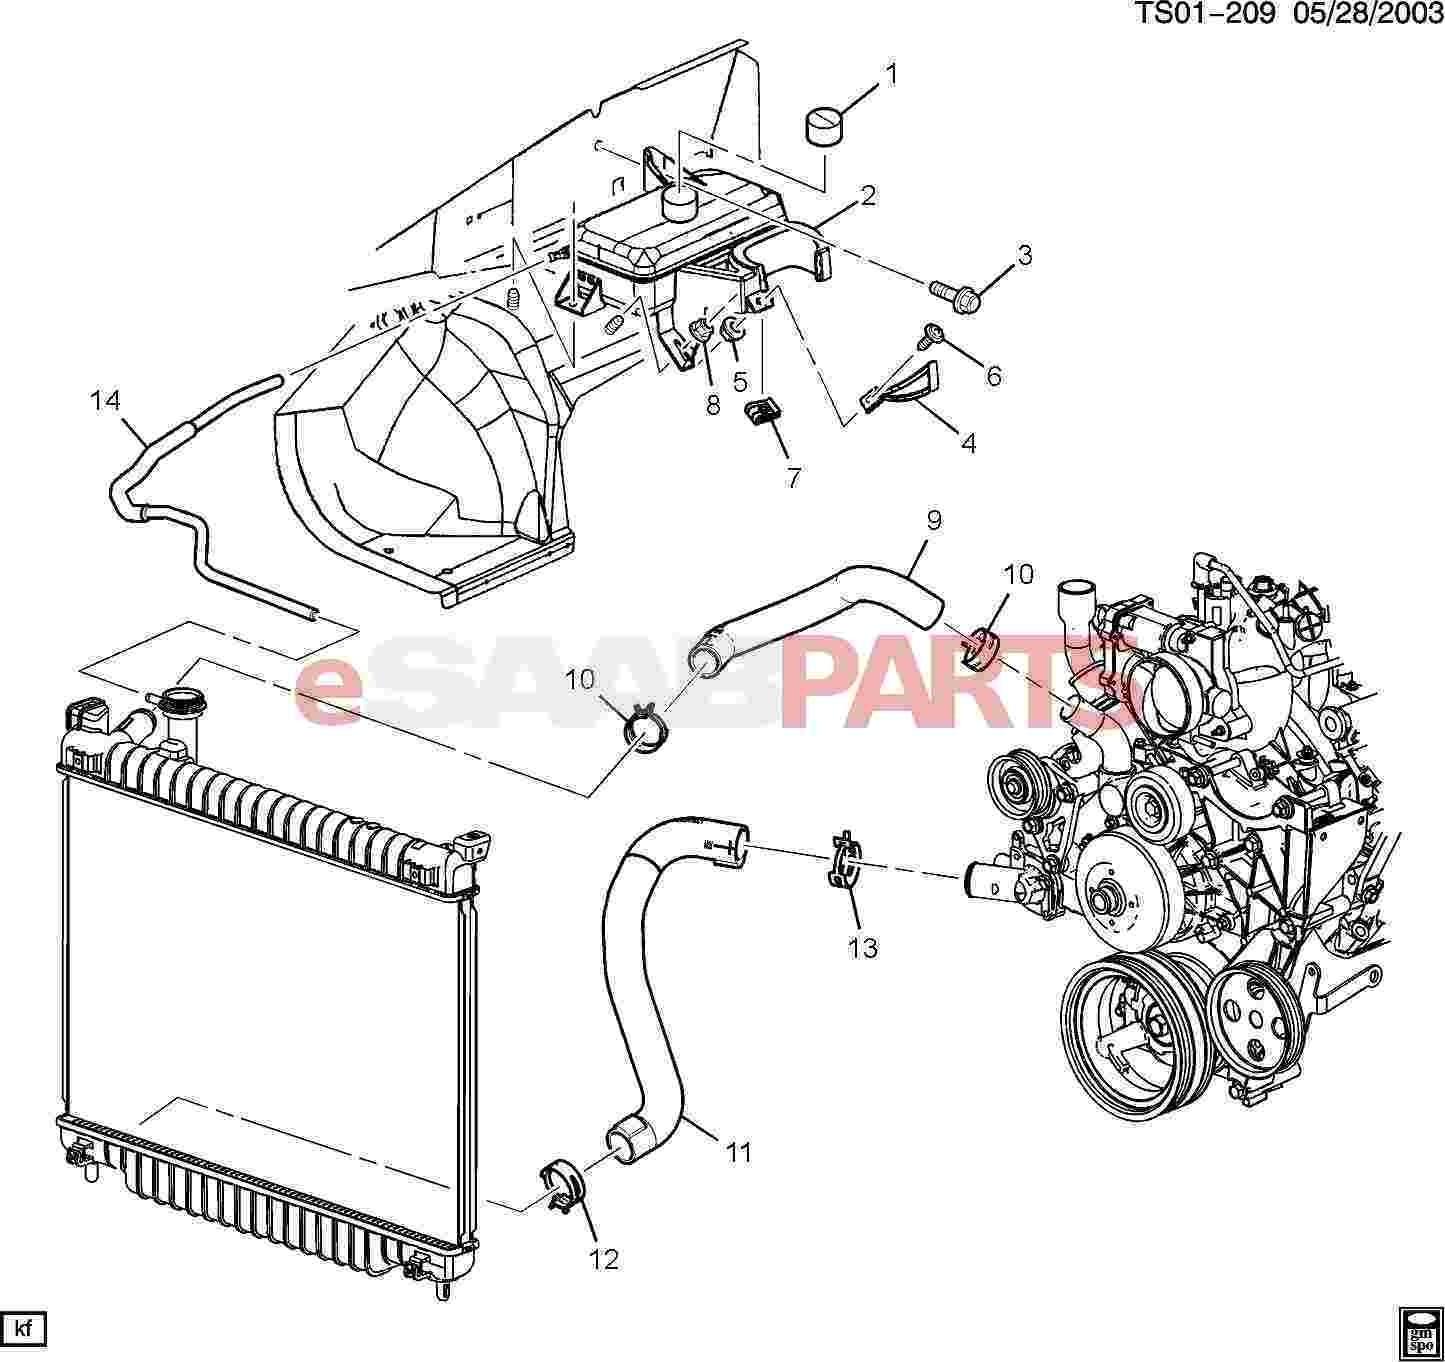 7 3 Engine Parts Diagram: 2003 Saab 9 5 Vacuum Hose Diagram At Nayabfun.com